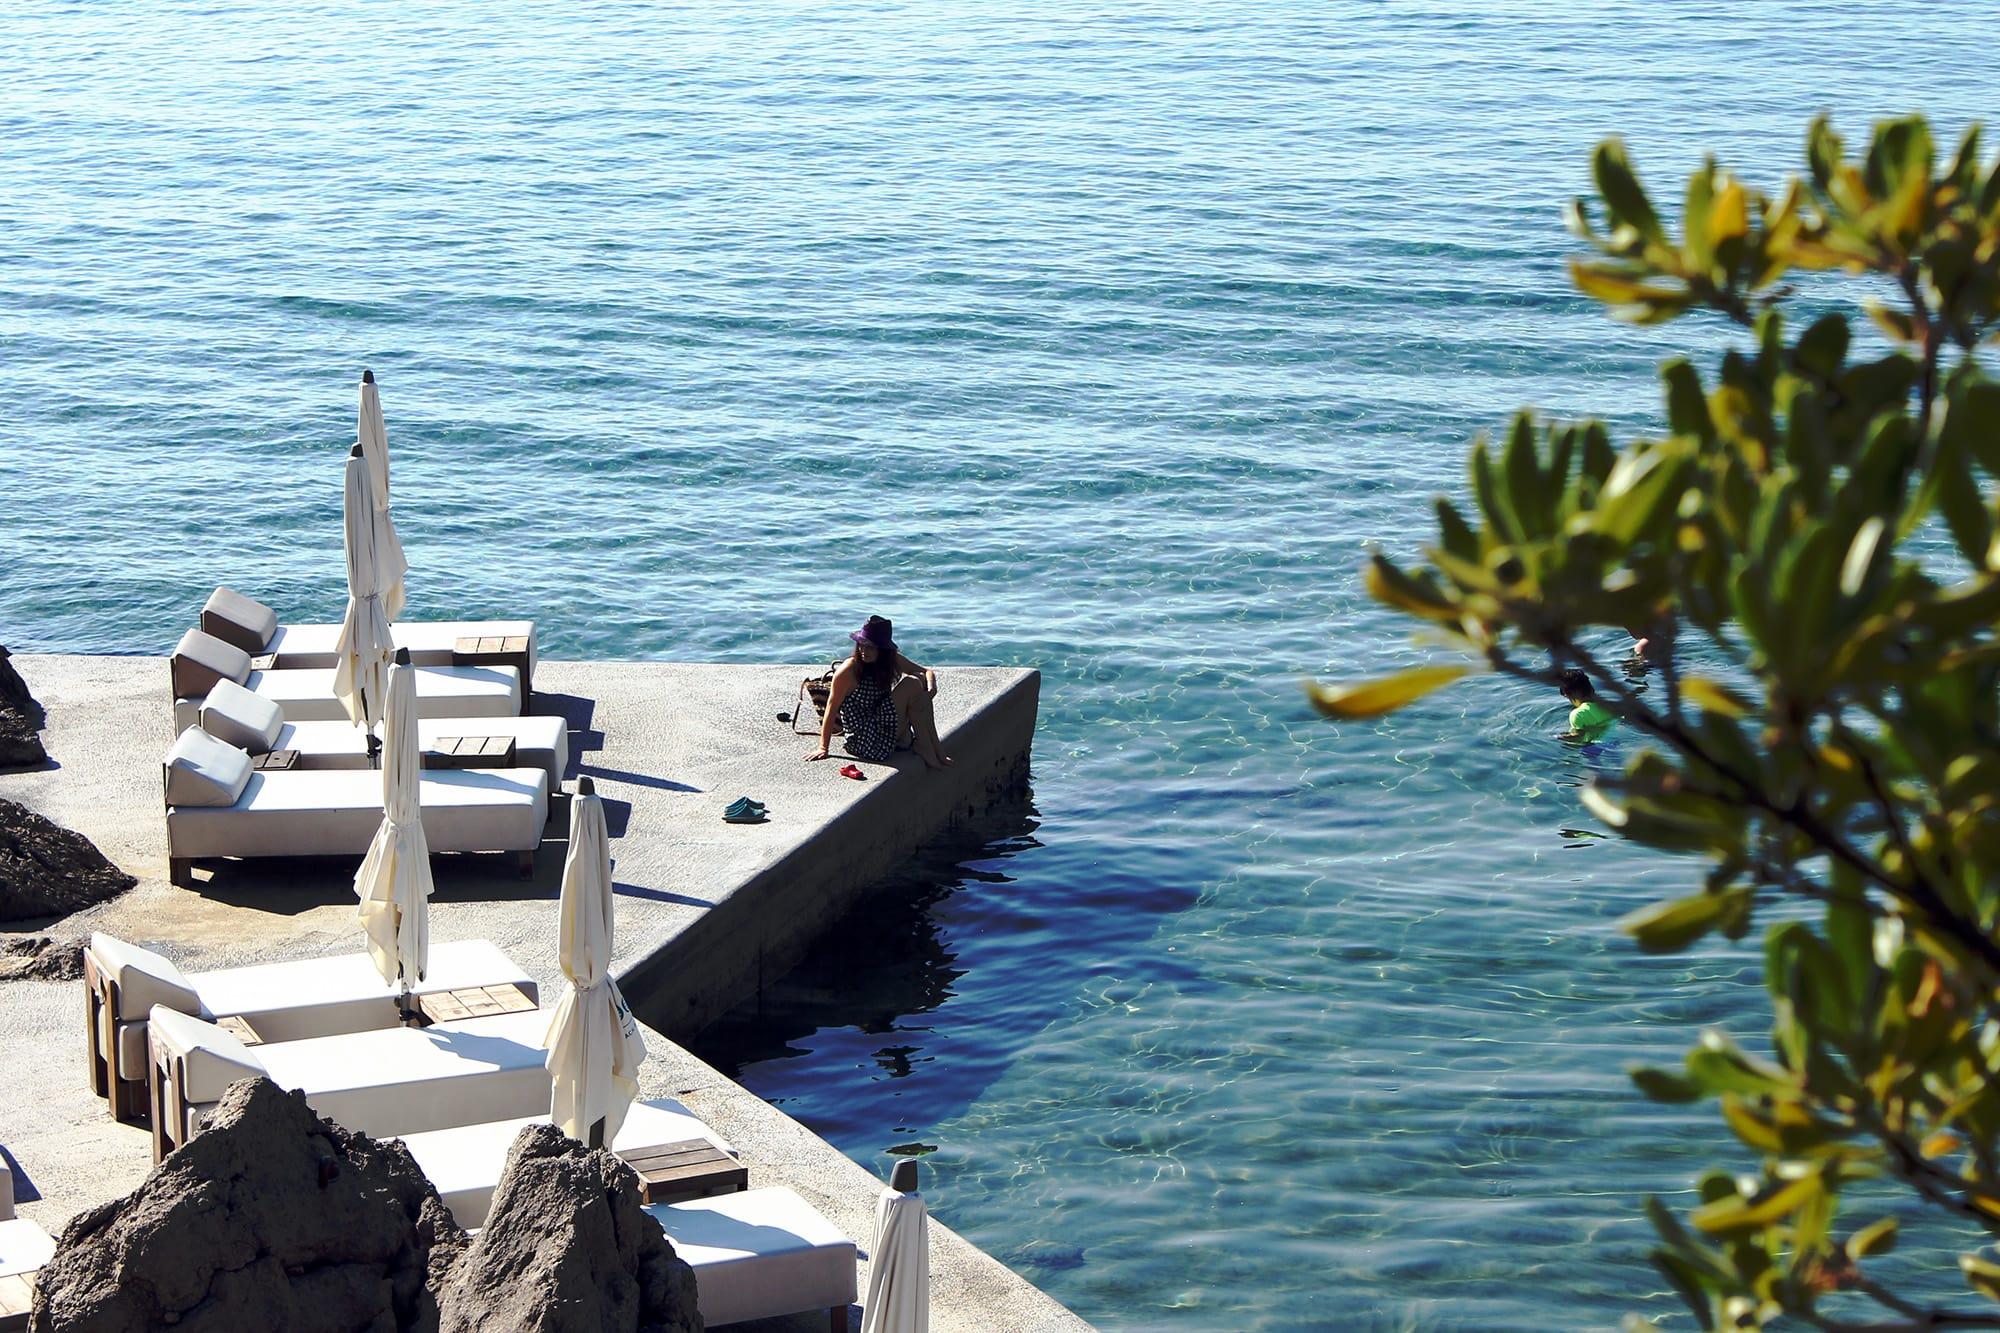 adriatic sea at opatija croatia